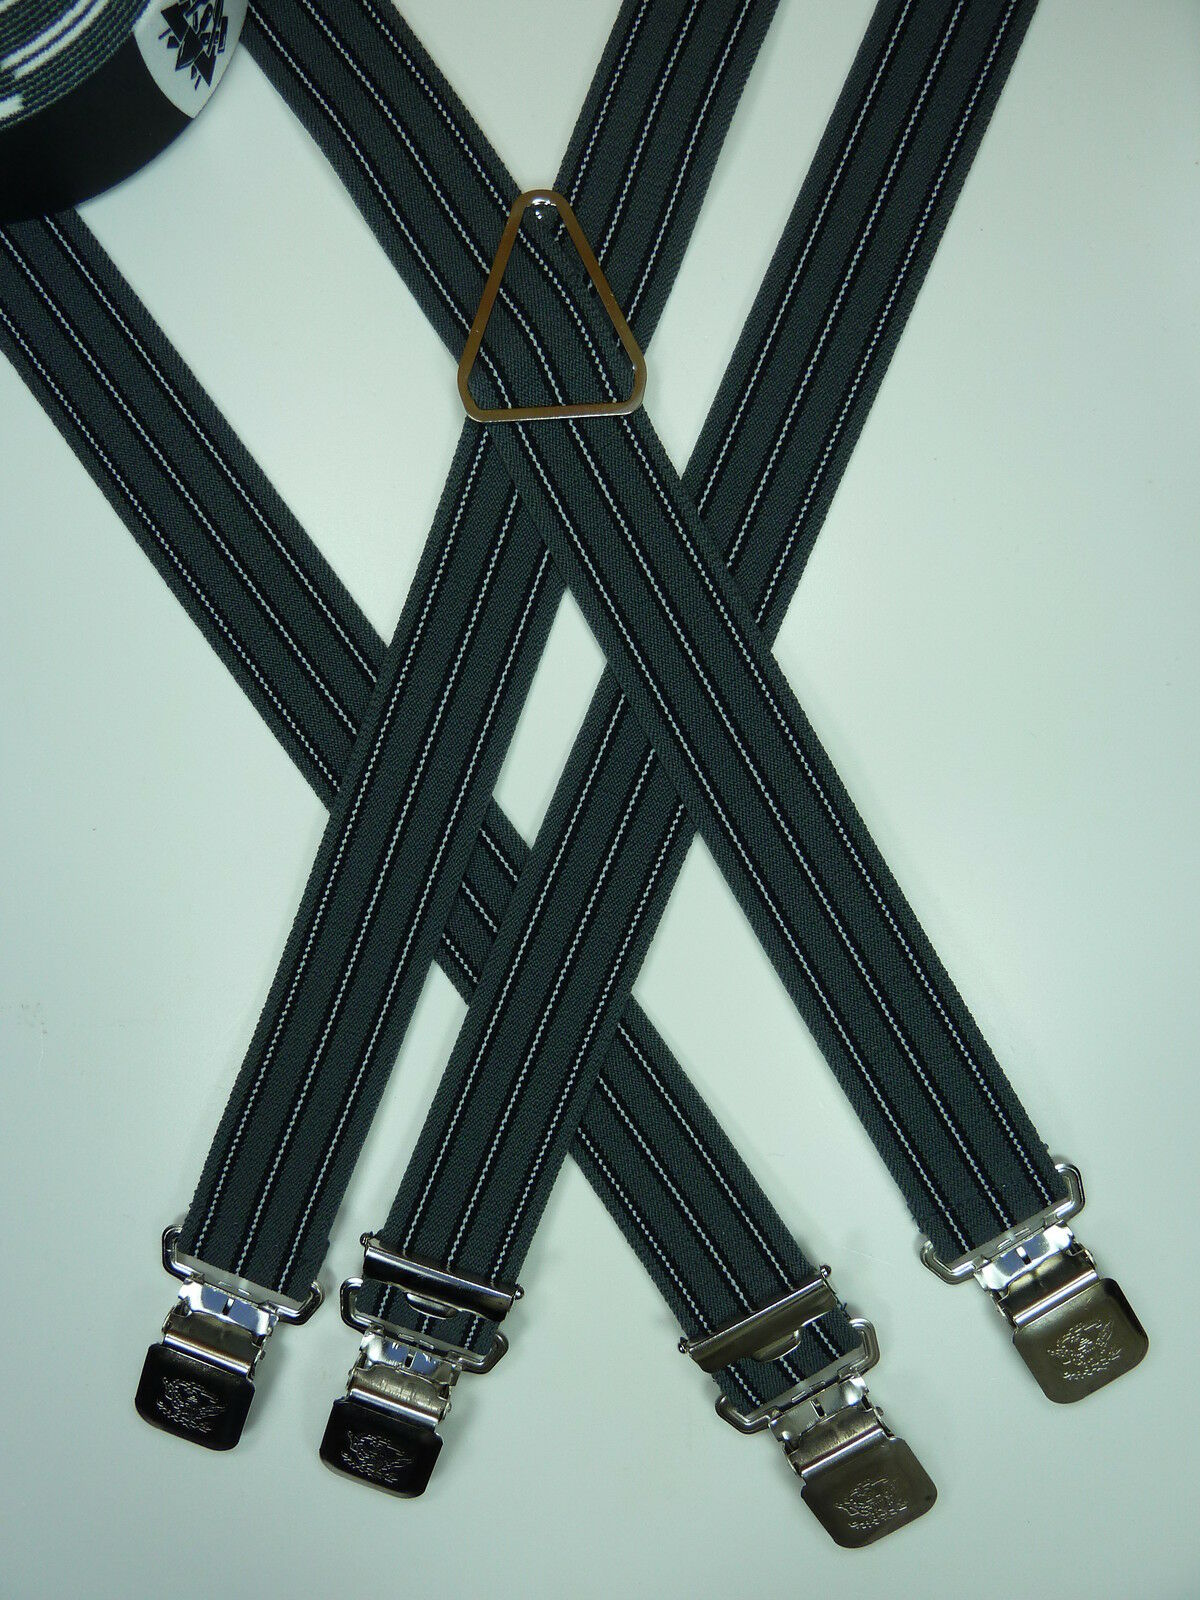 Hosenträger,grau-schwarz,4 Alligatorklips,Metallrückenteil,35 mm breit